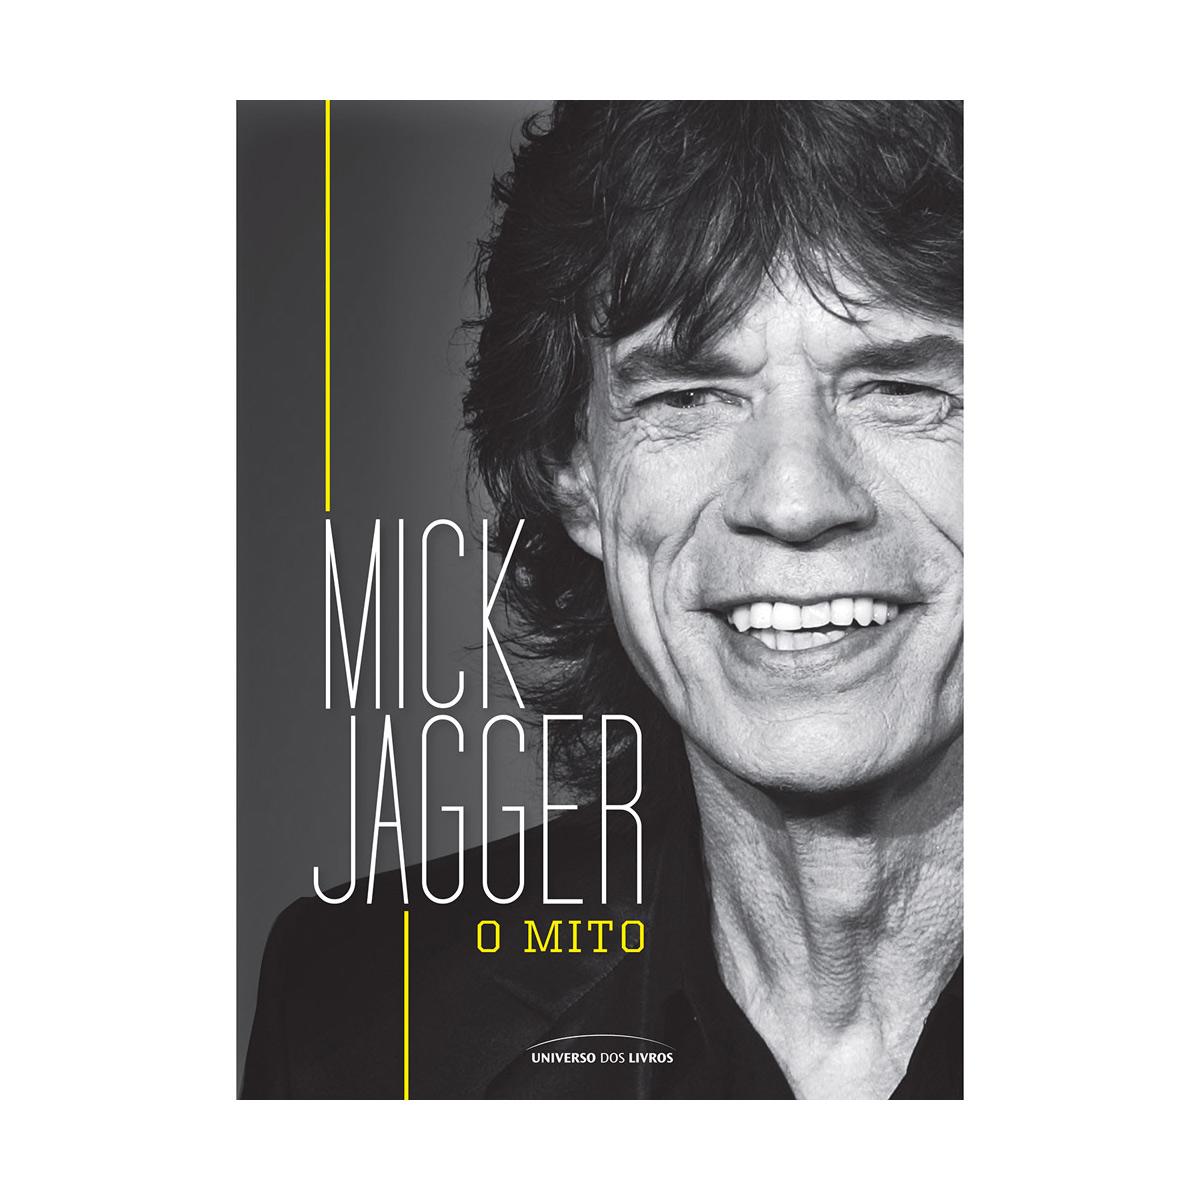 Livro Mick Jagger O Mito